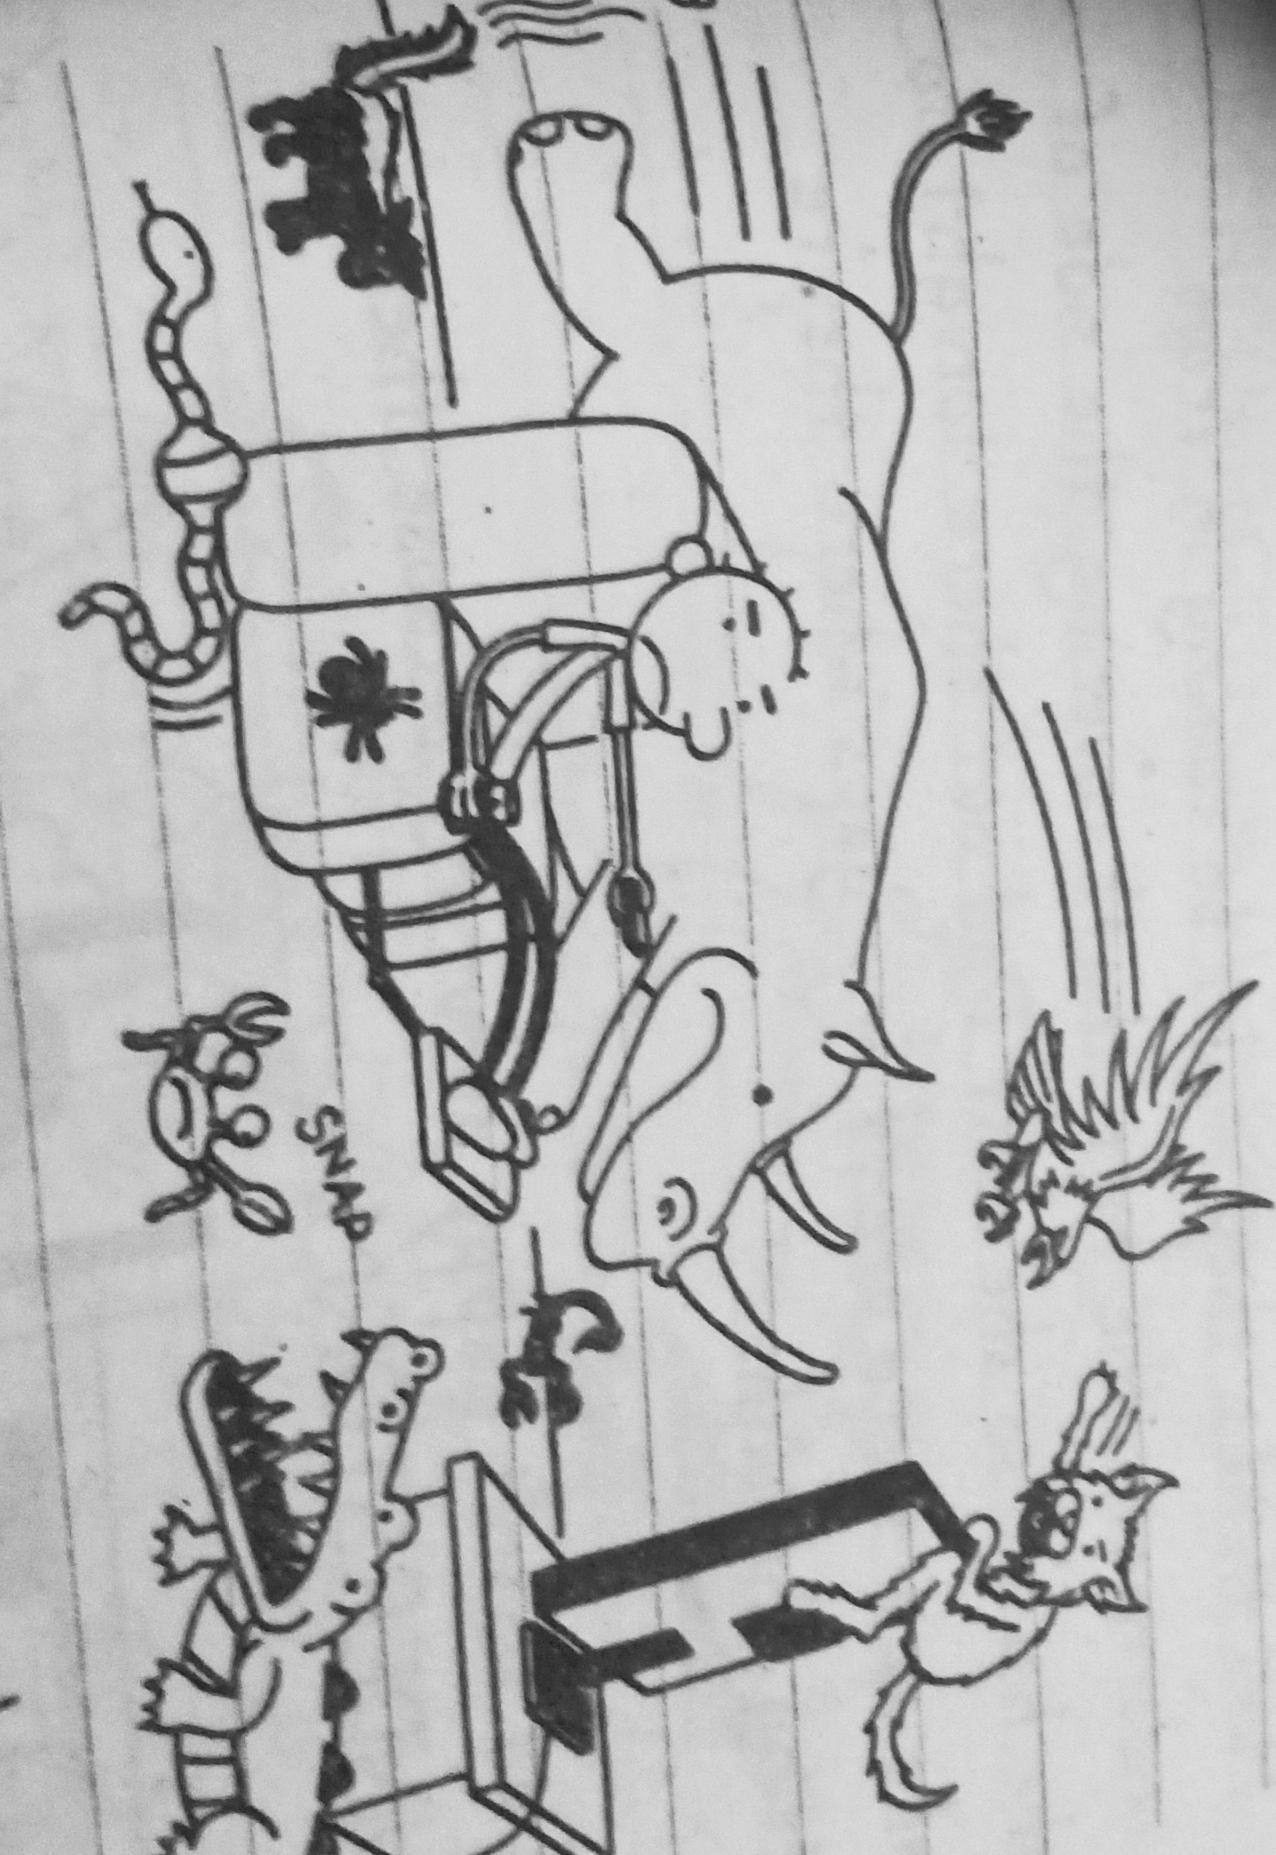 Rodrick's imaginary pets